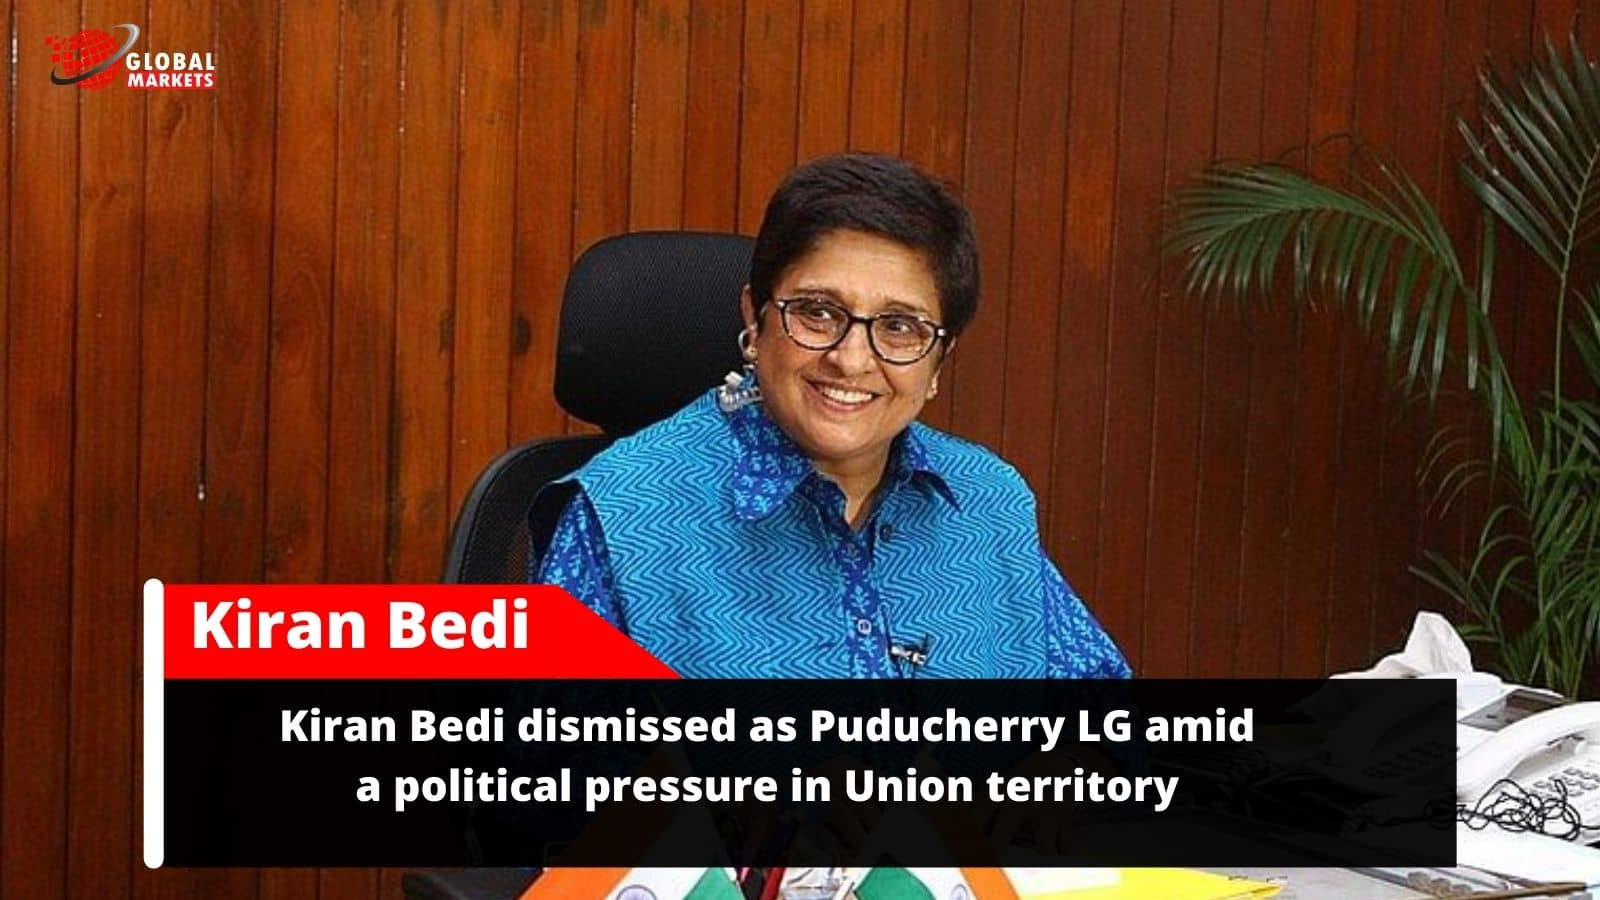 Kiran Bedi dismissed as Puducherry LG amid a political pressure in Union territory